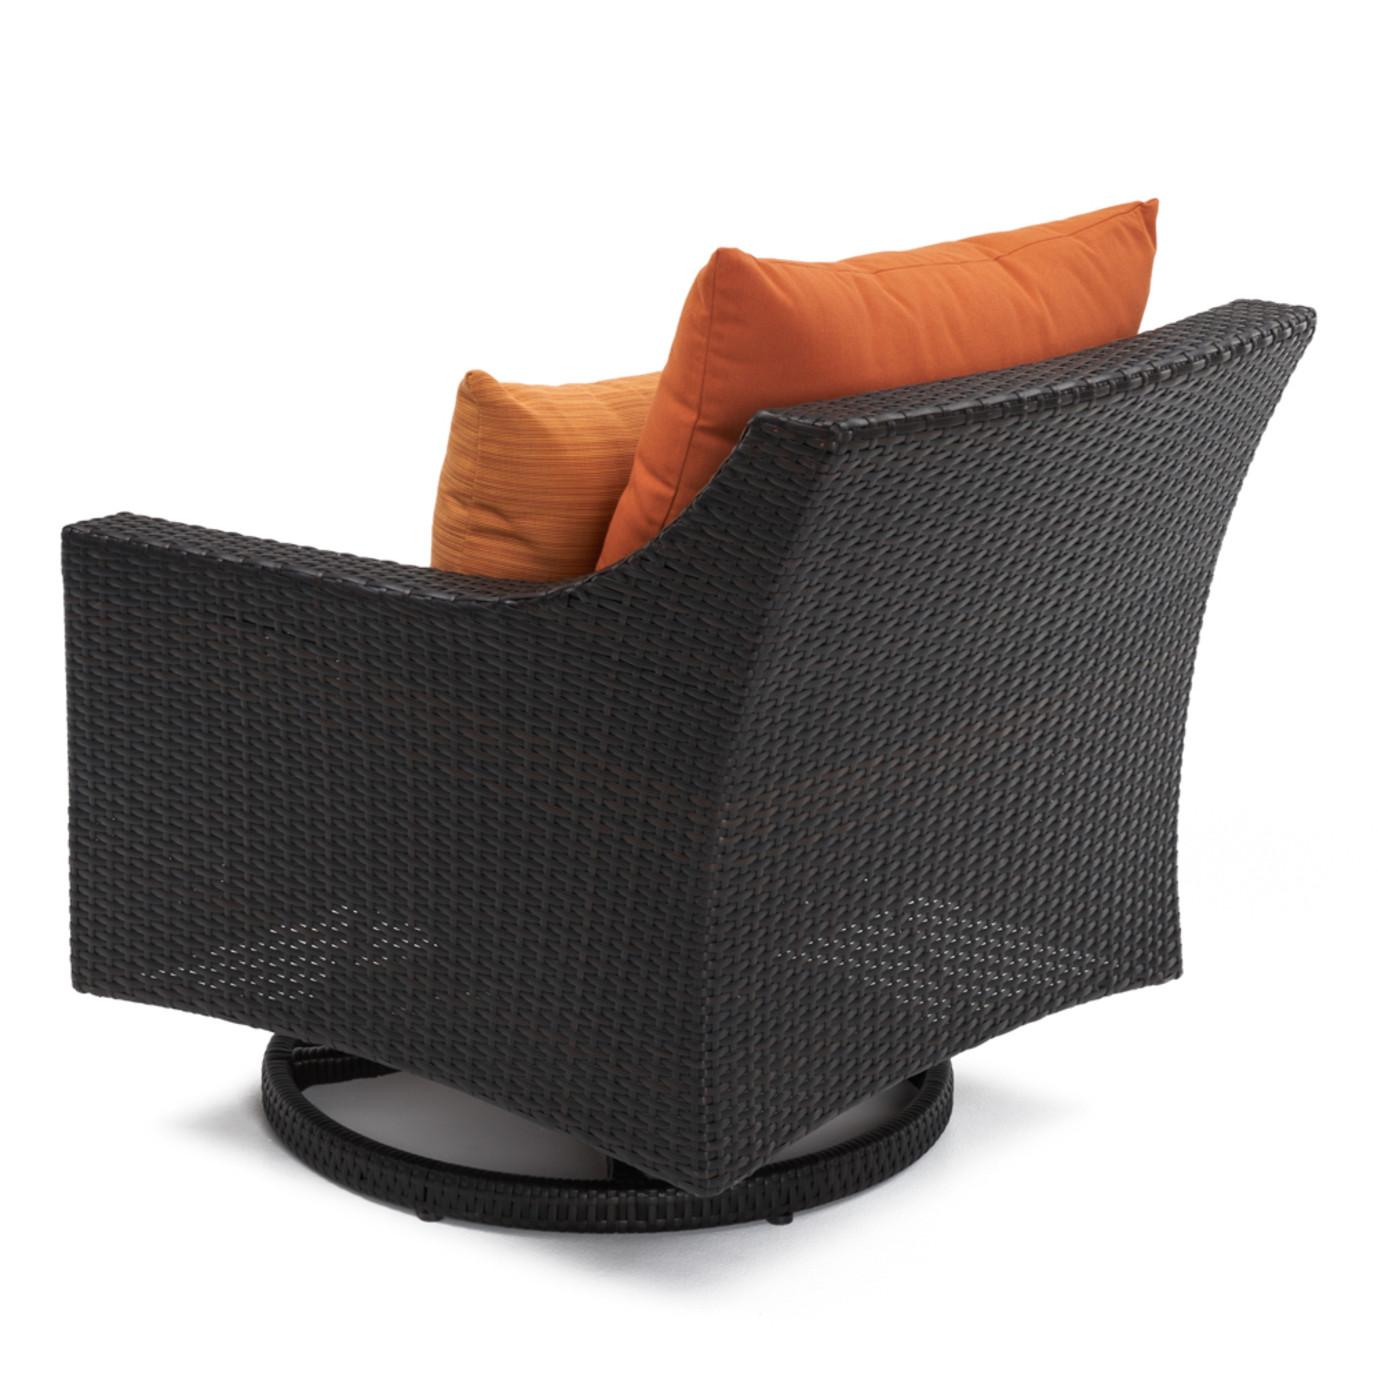 Deco Deluxe 6pc Love & Motion Club Seating Set - Tikka Orange